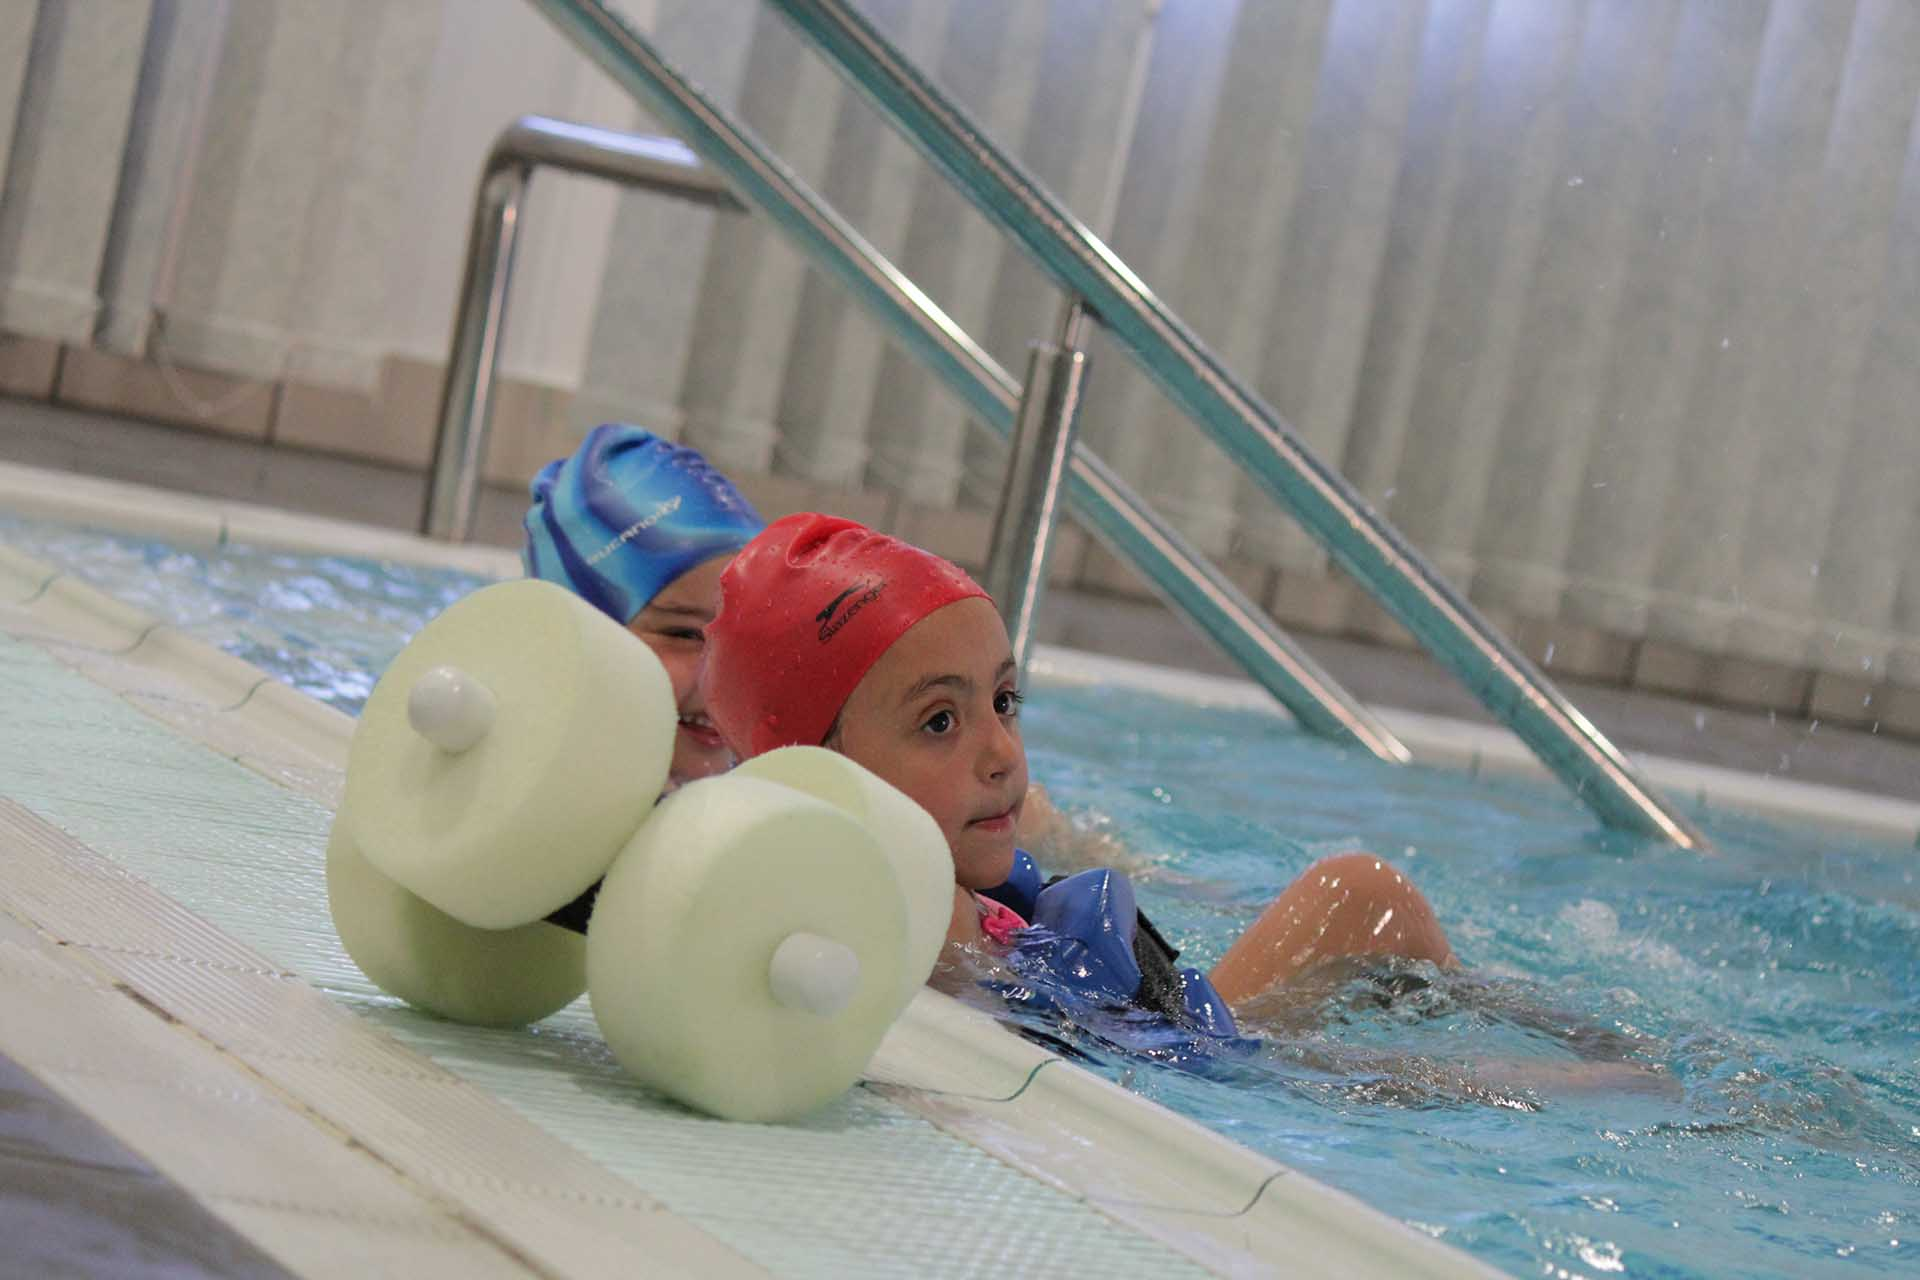 Toumazi Physio Gallery - Hydrotherapy